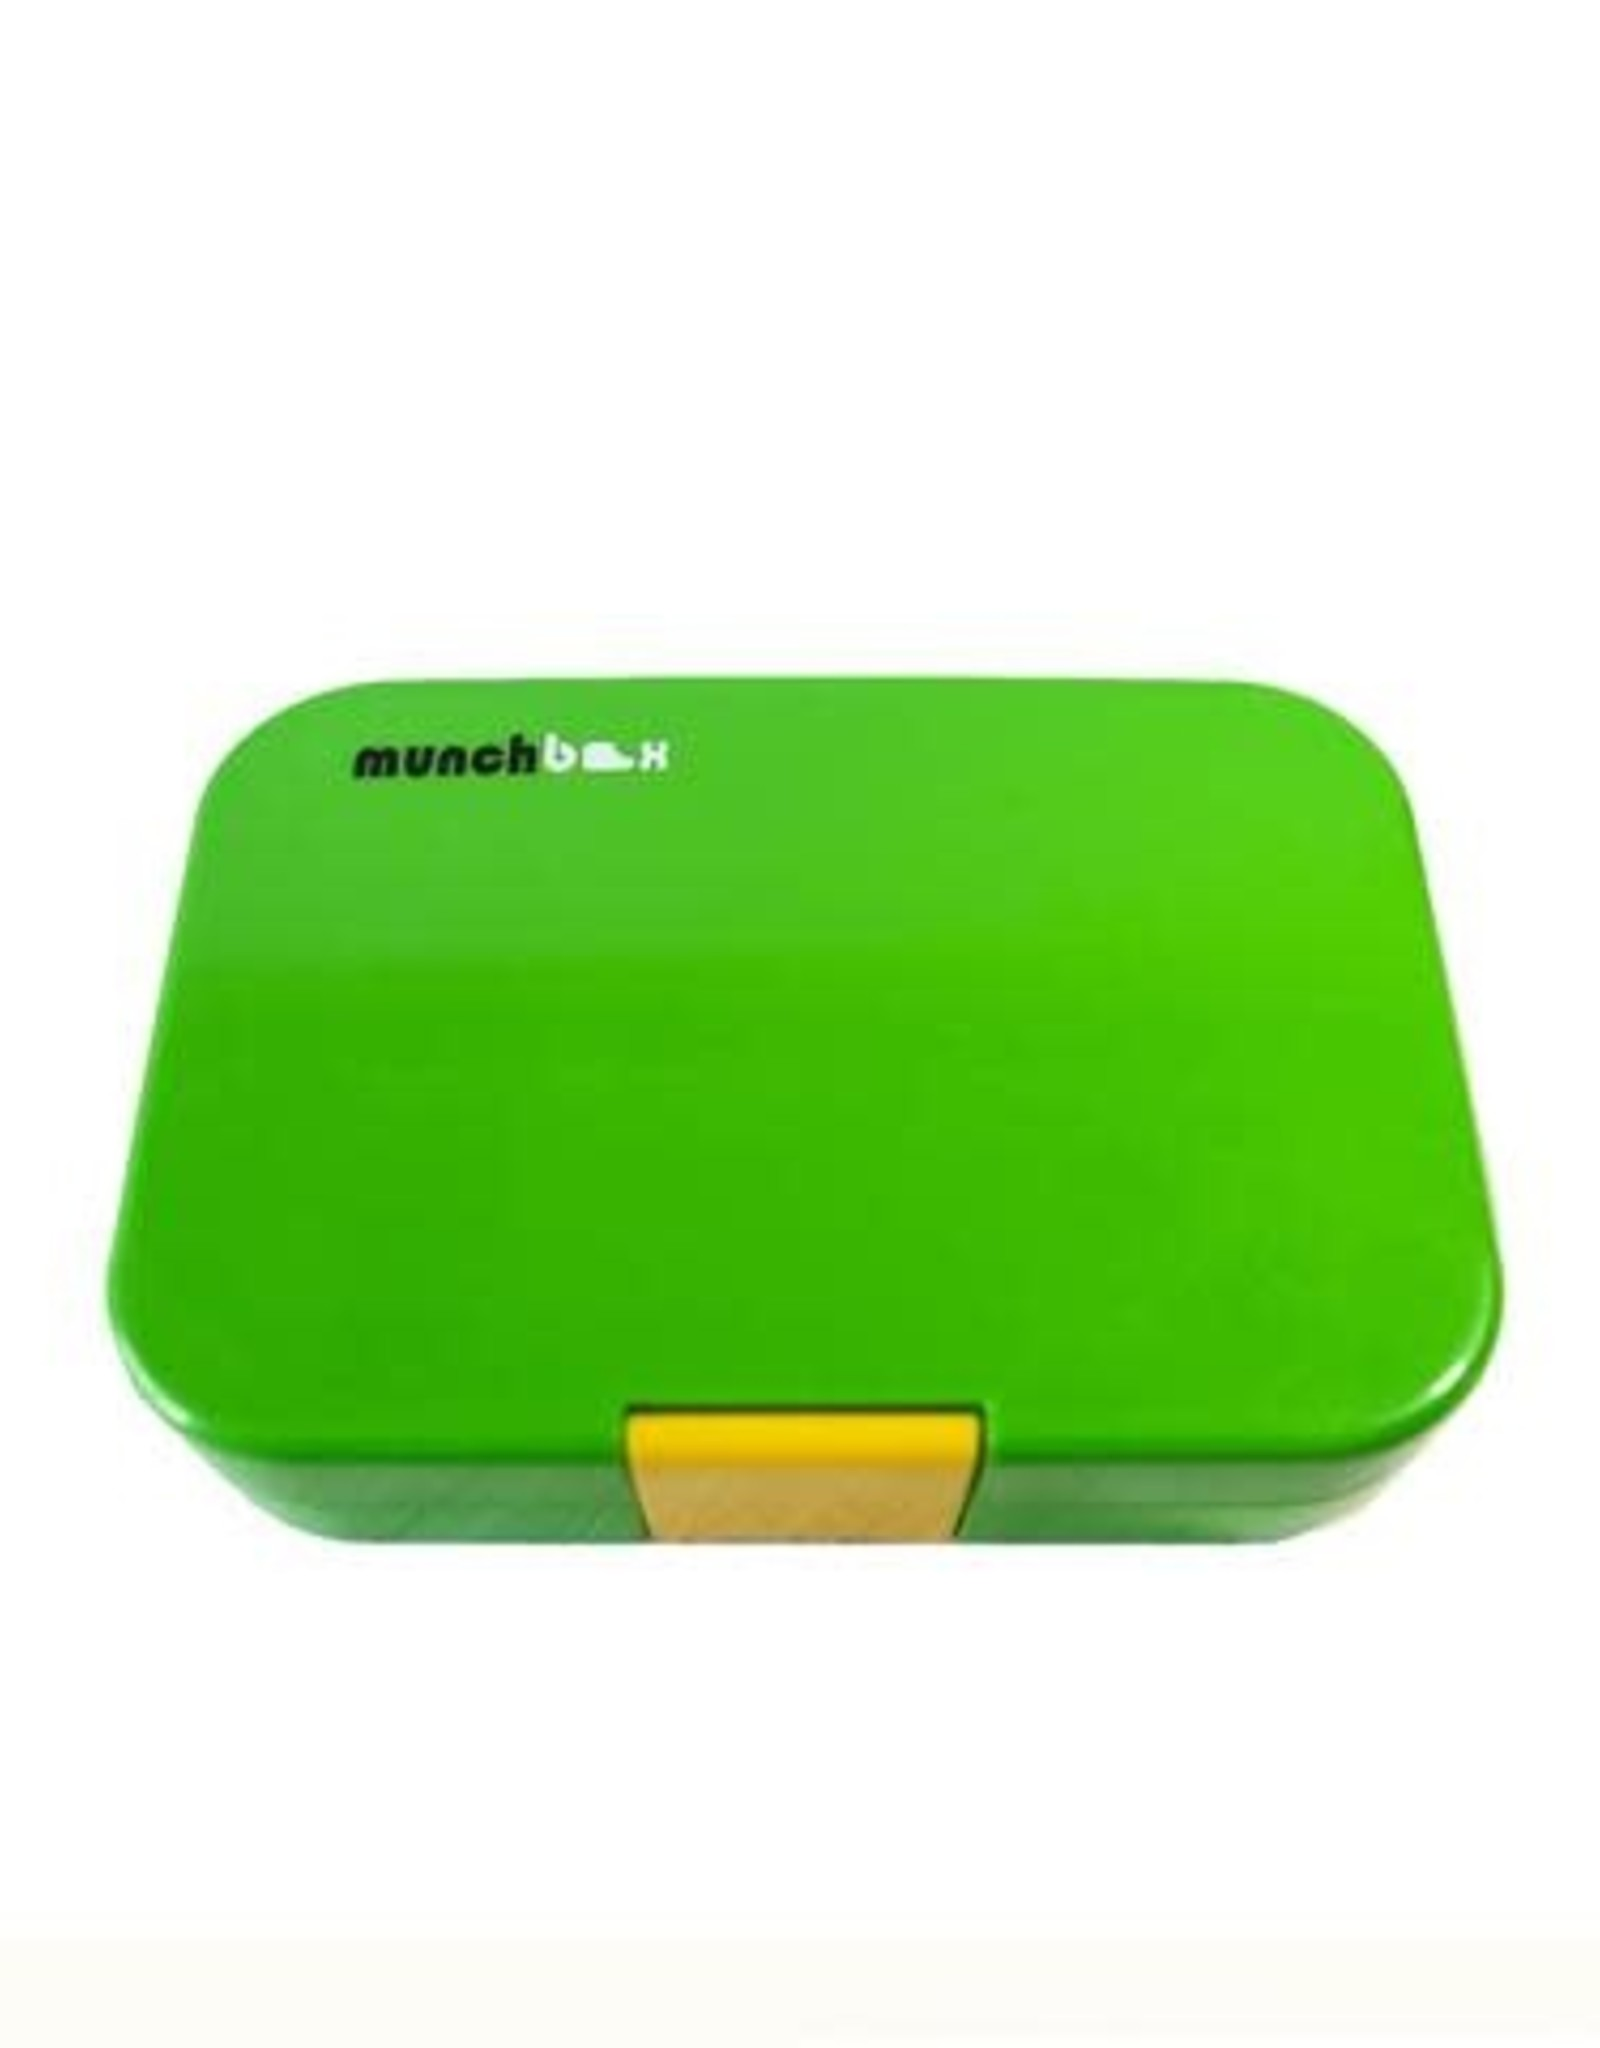 Munchbox Munchbox Bento Maxi 6 - Green Jungle